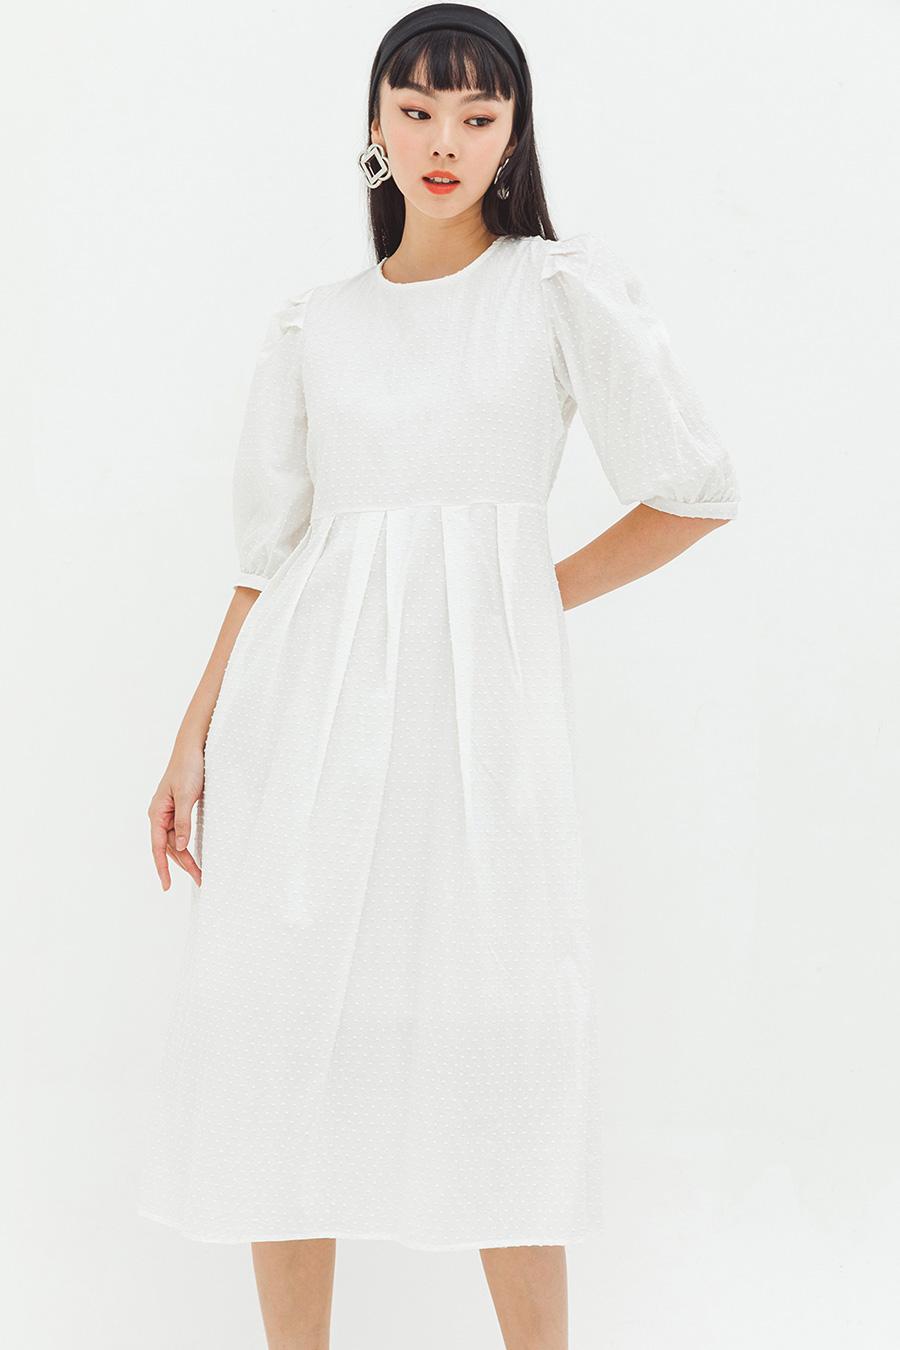 MISHAL DRESS - IVORY